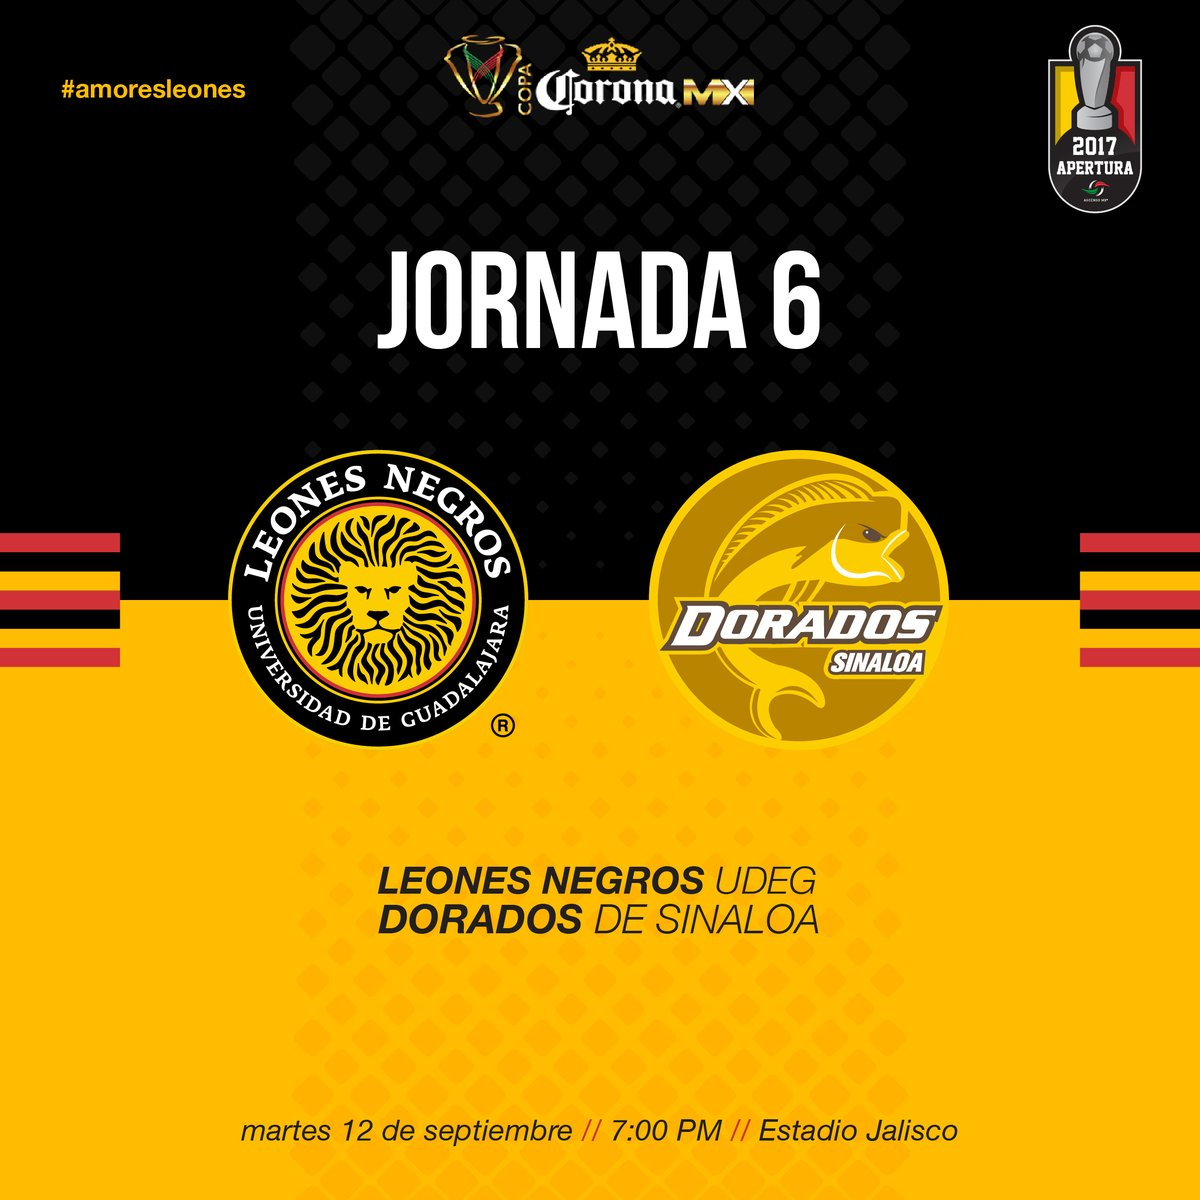 Leones Negros recibe a Dorados en la última jornada de la Copa Mx